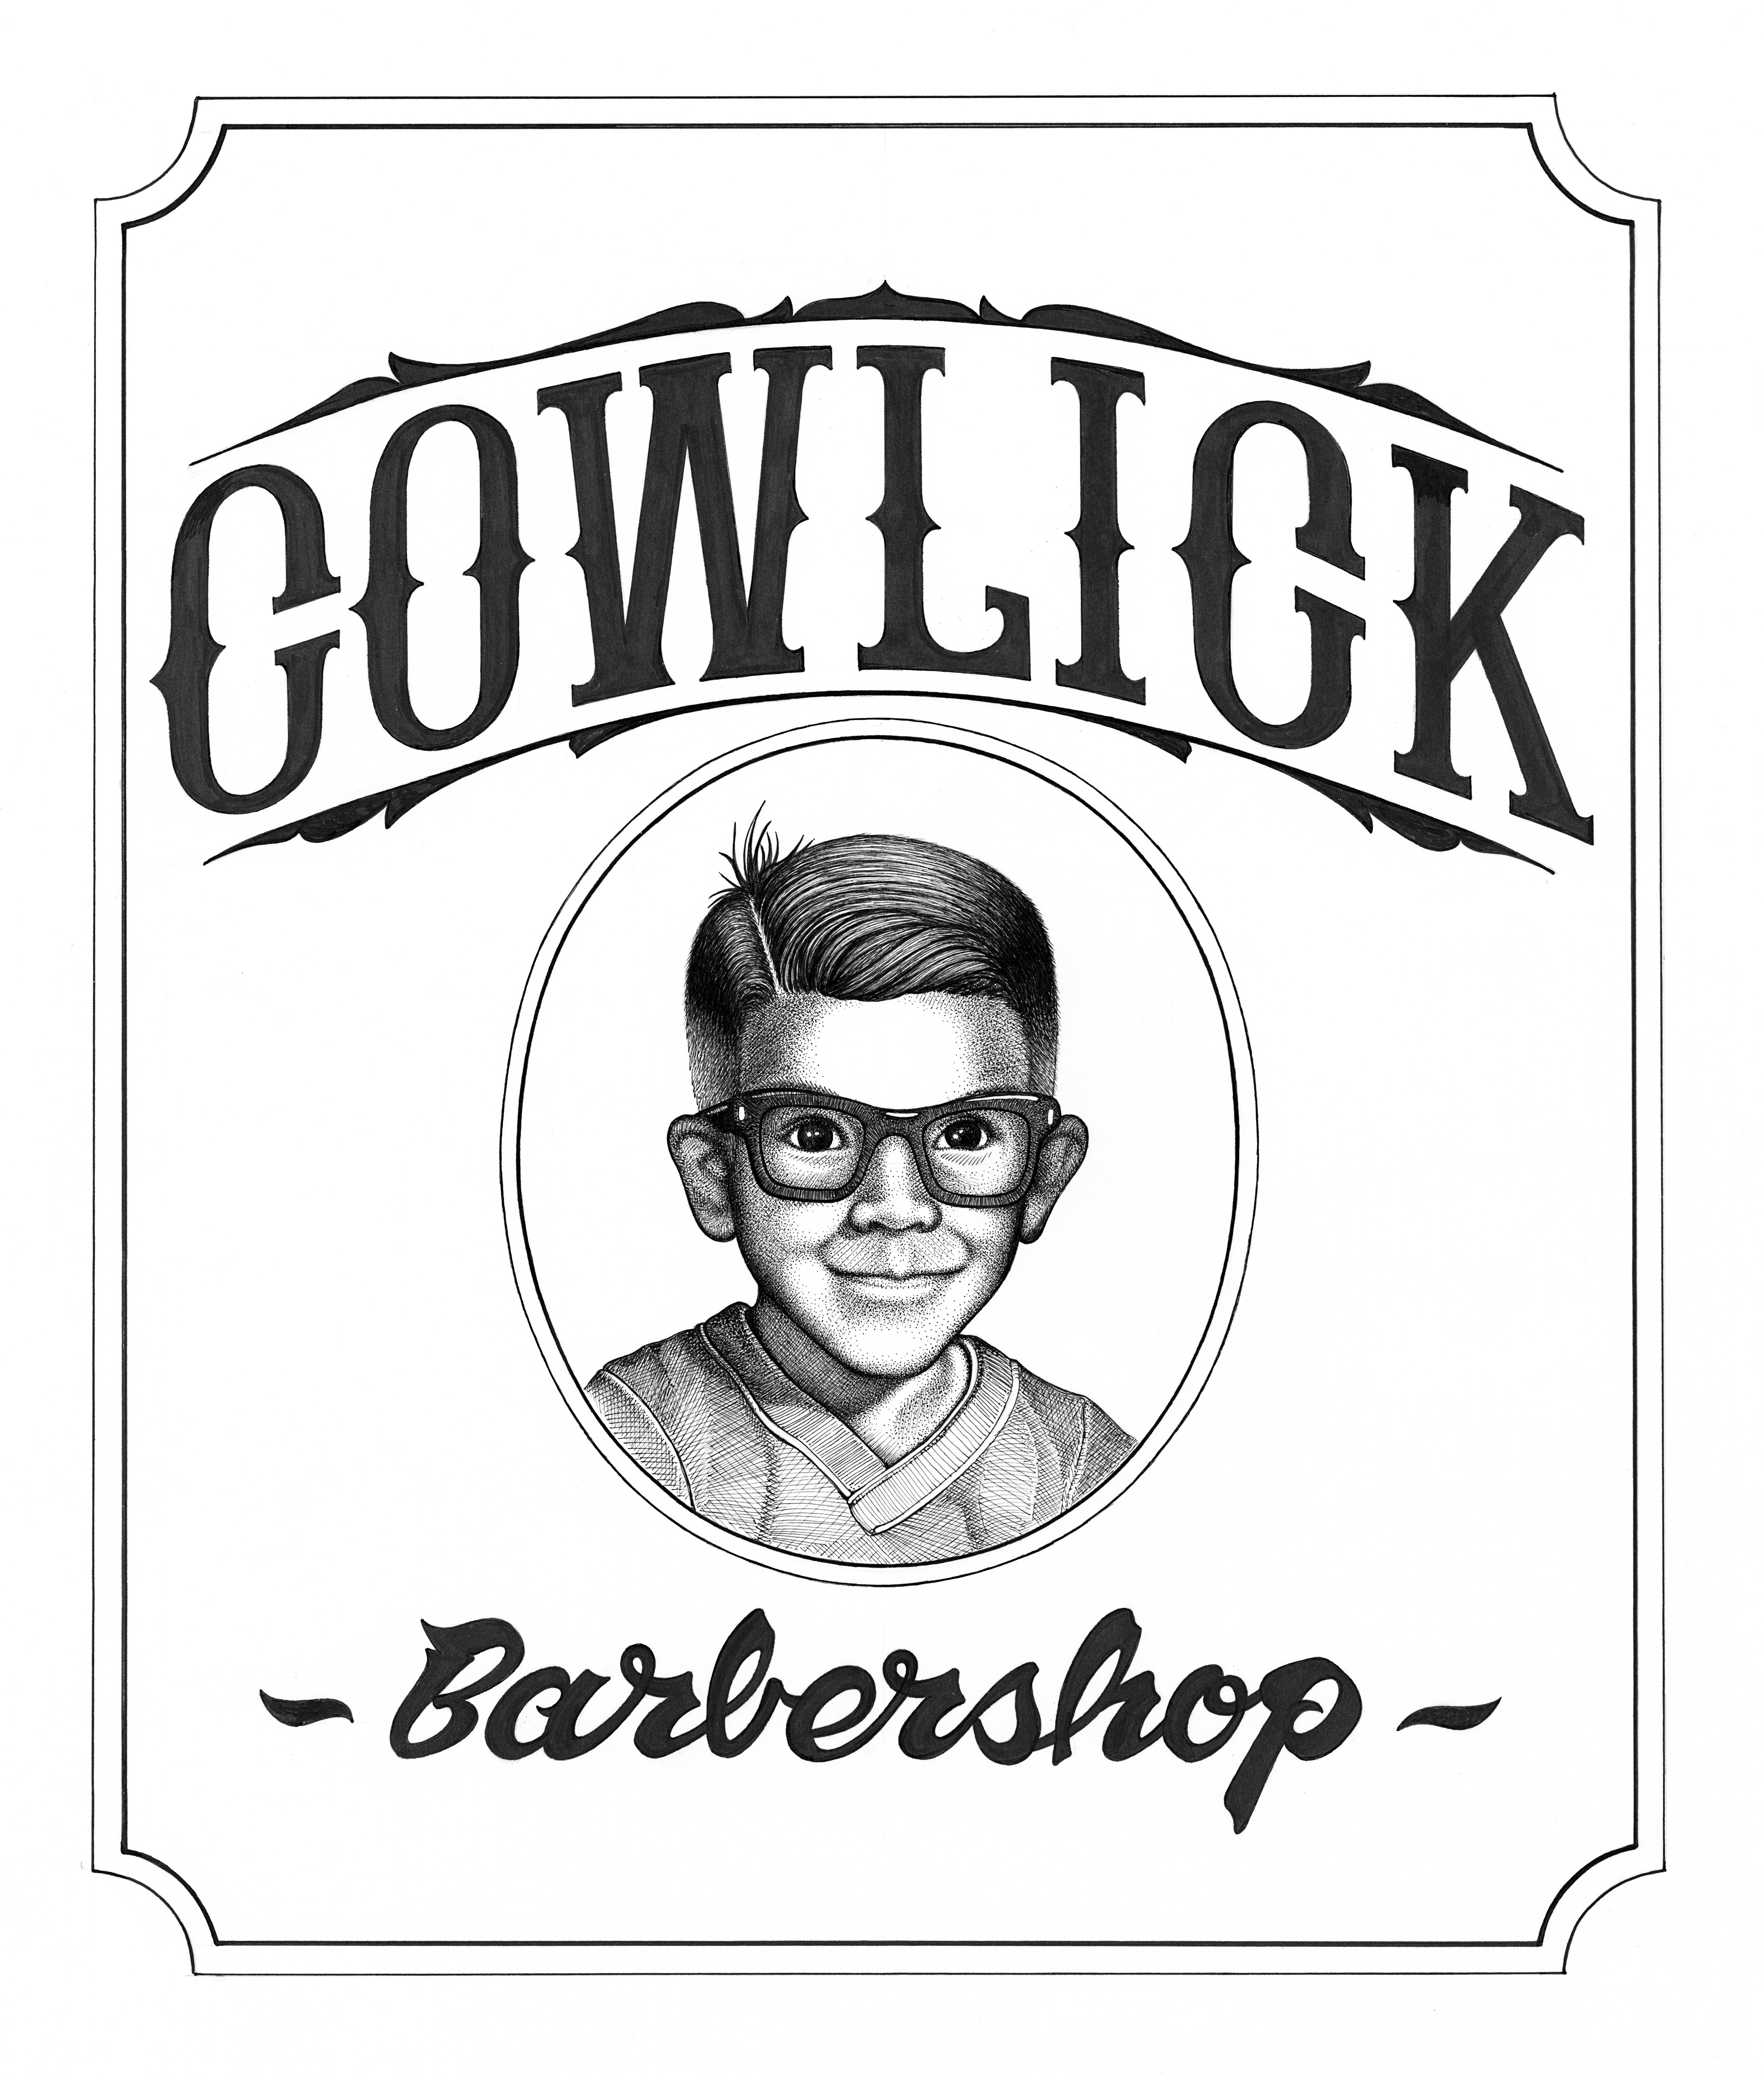 Cowlick Barbershop